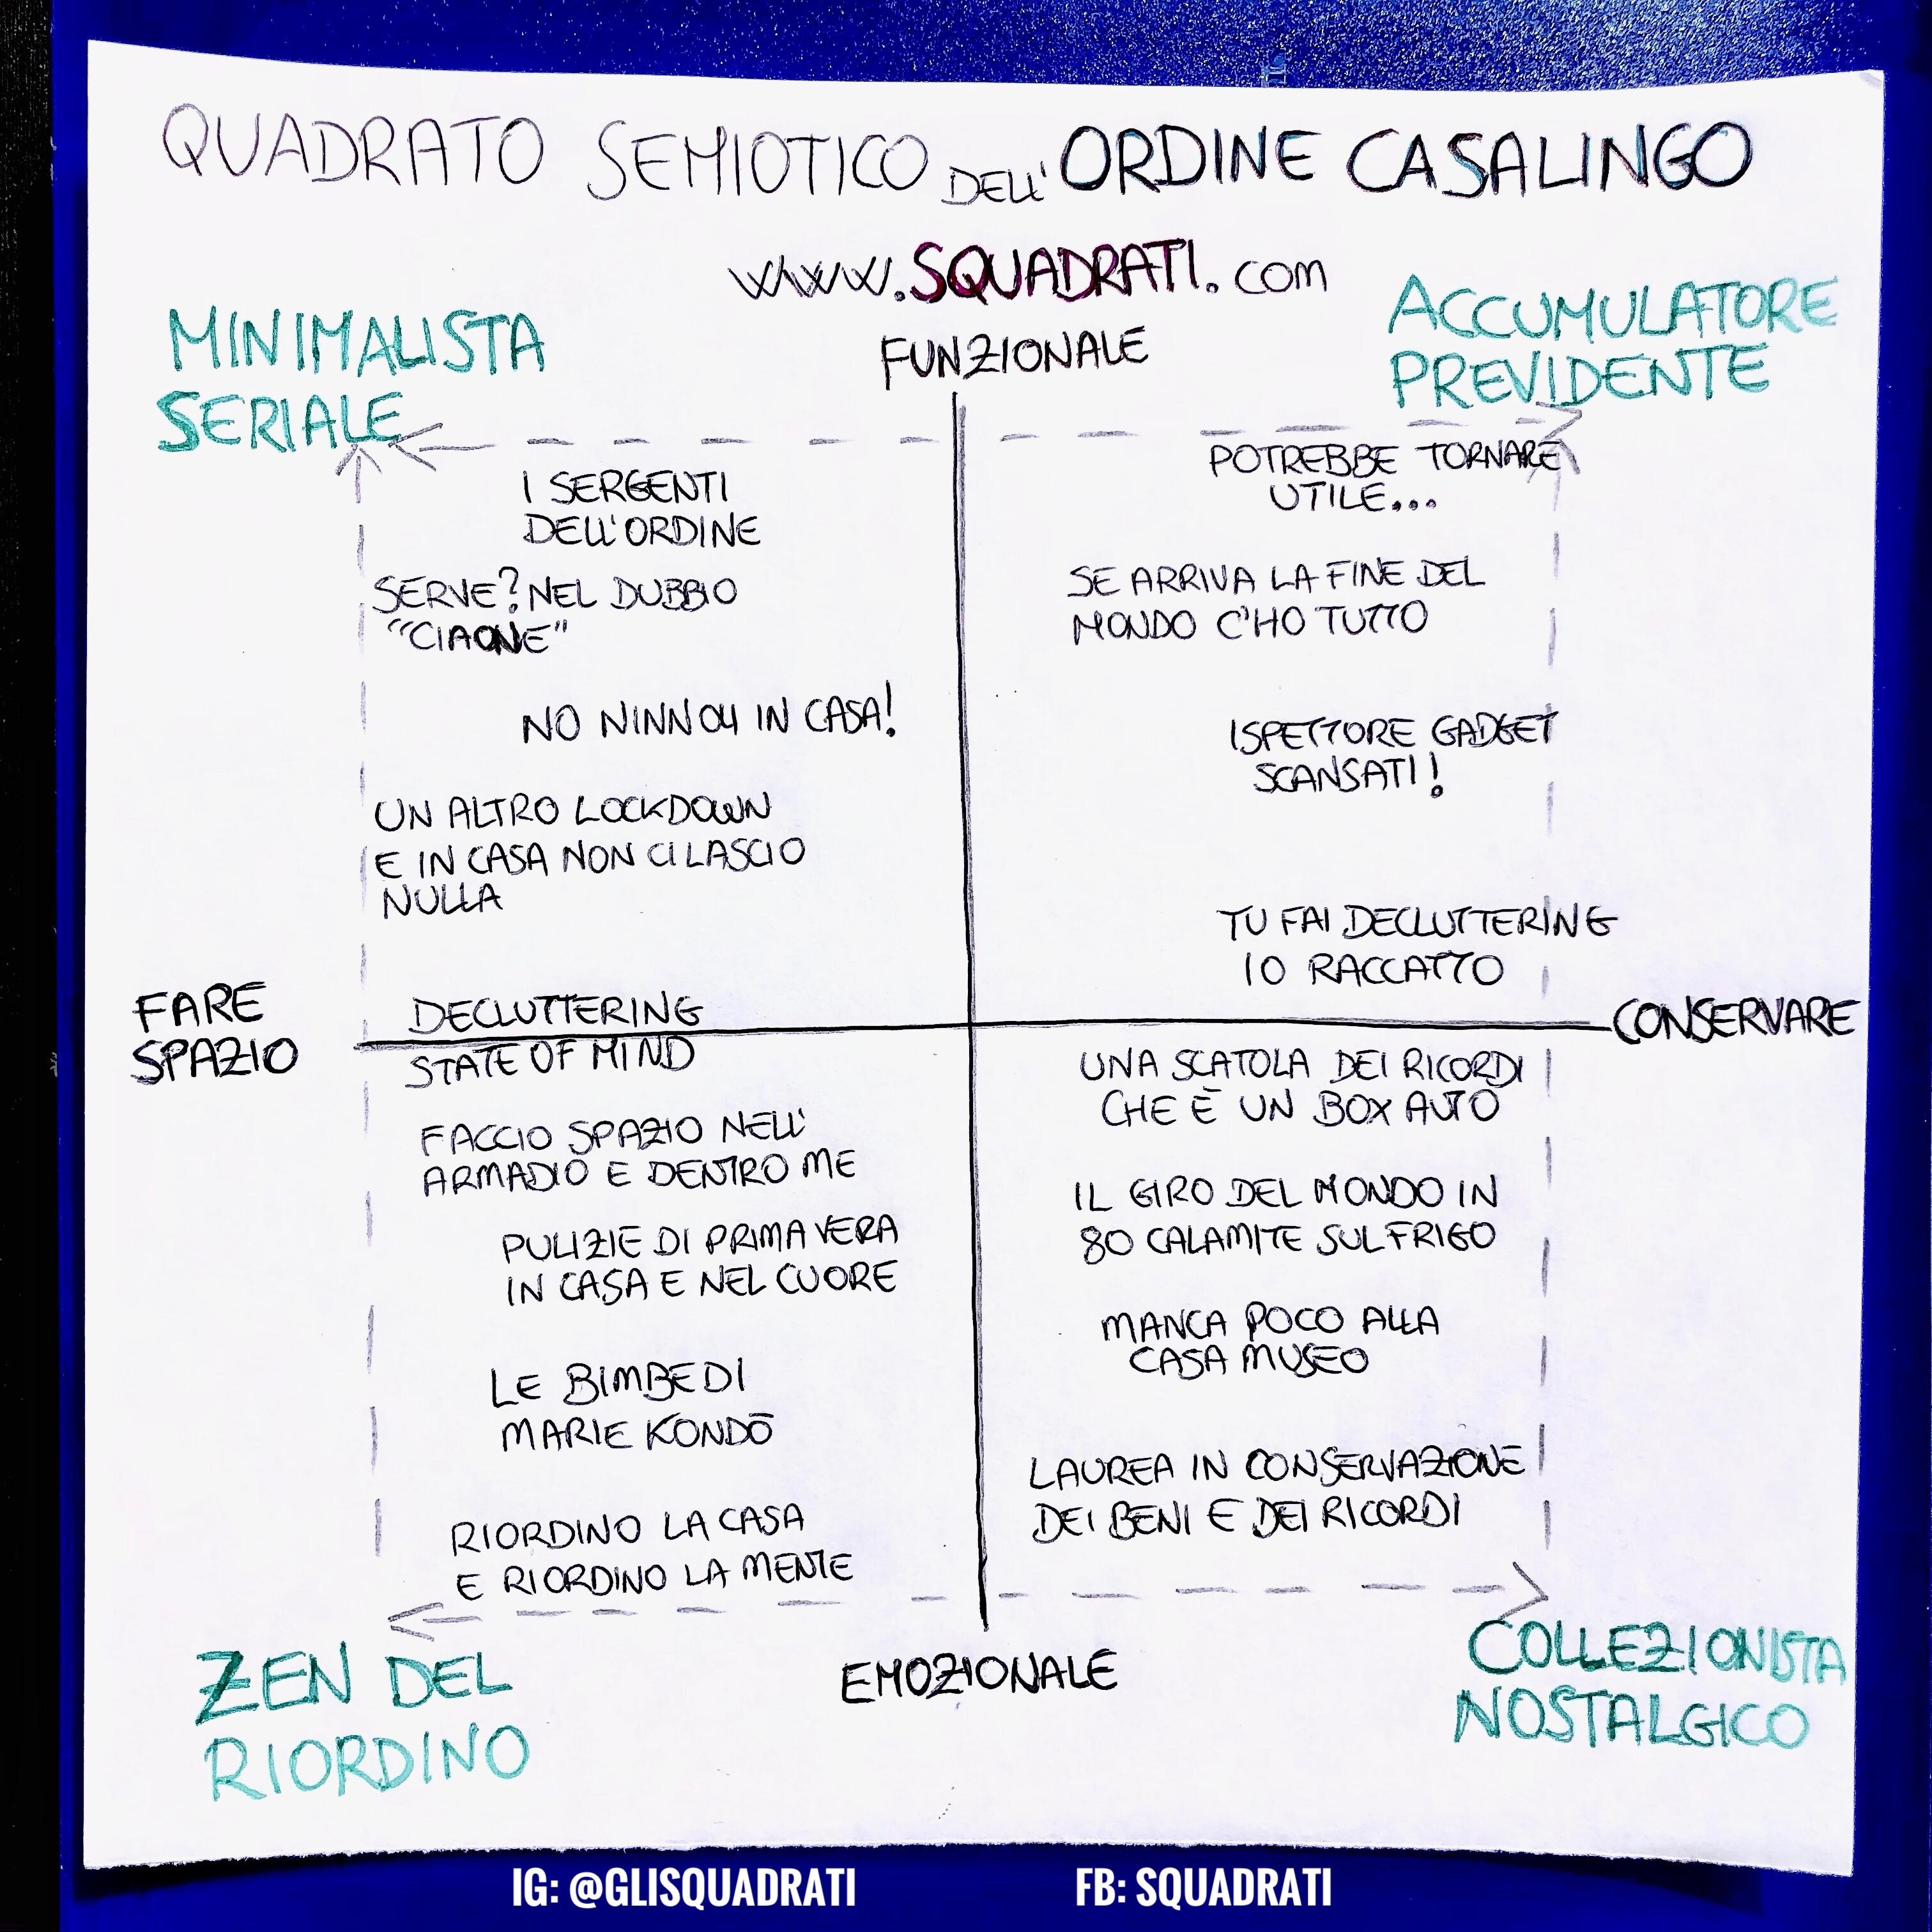 Quadrato Semiotico Ordine Casalingo - Squadrati 2